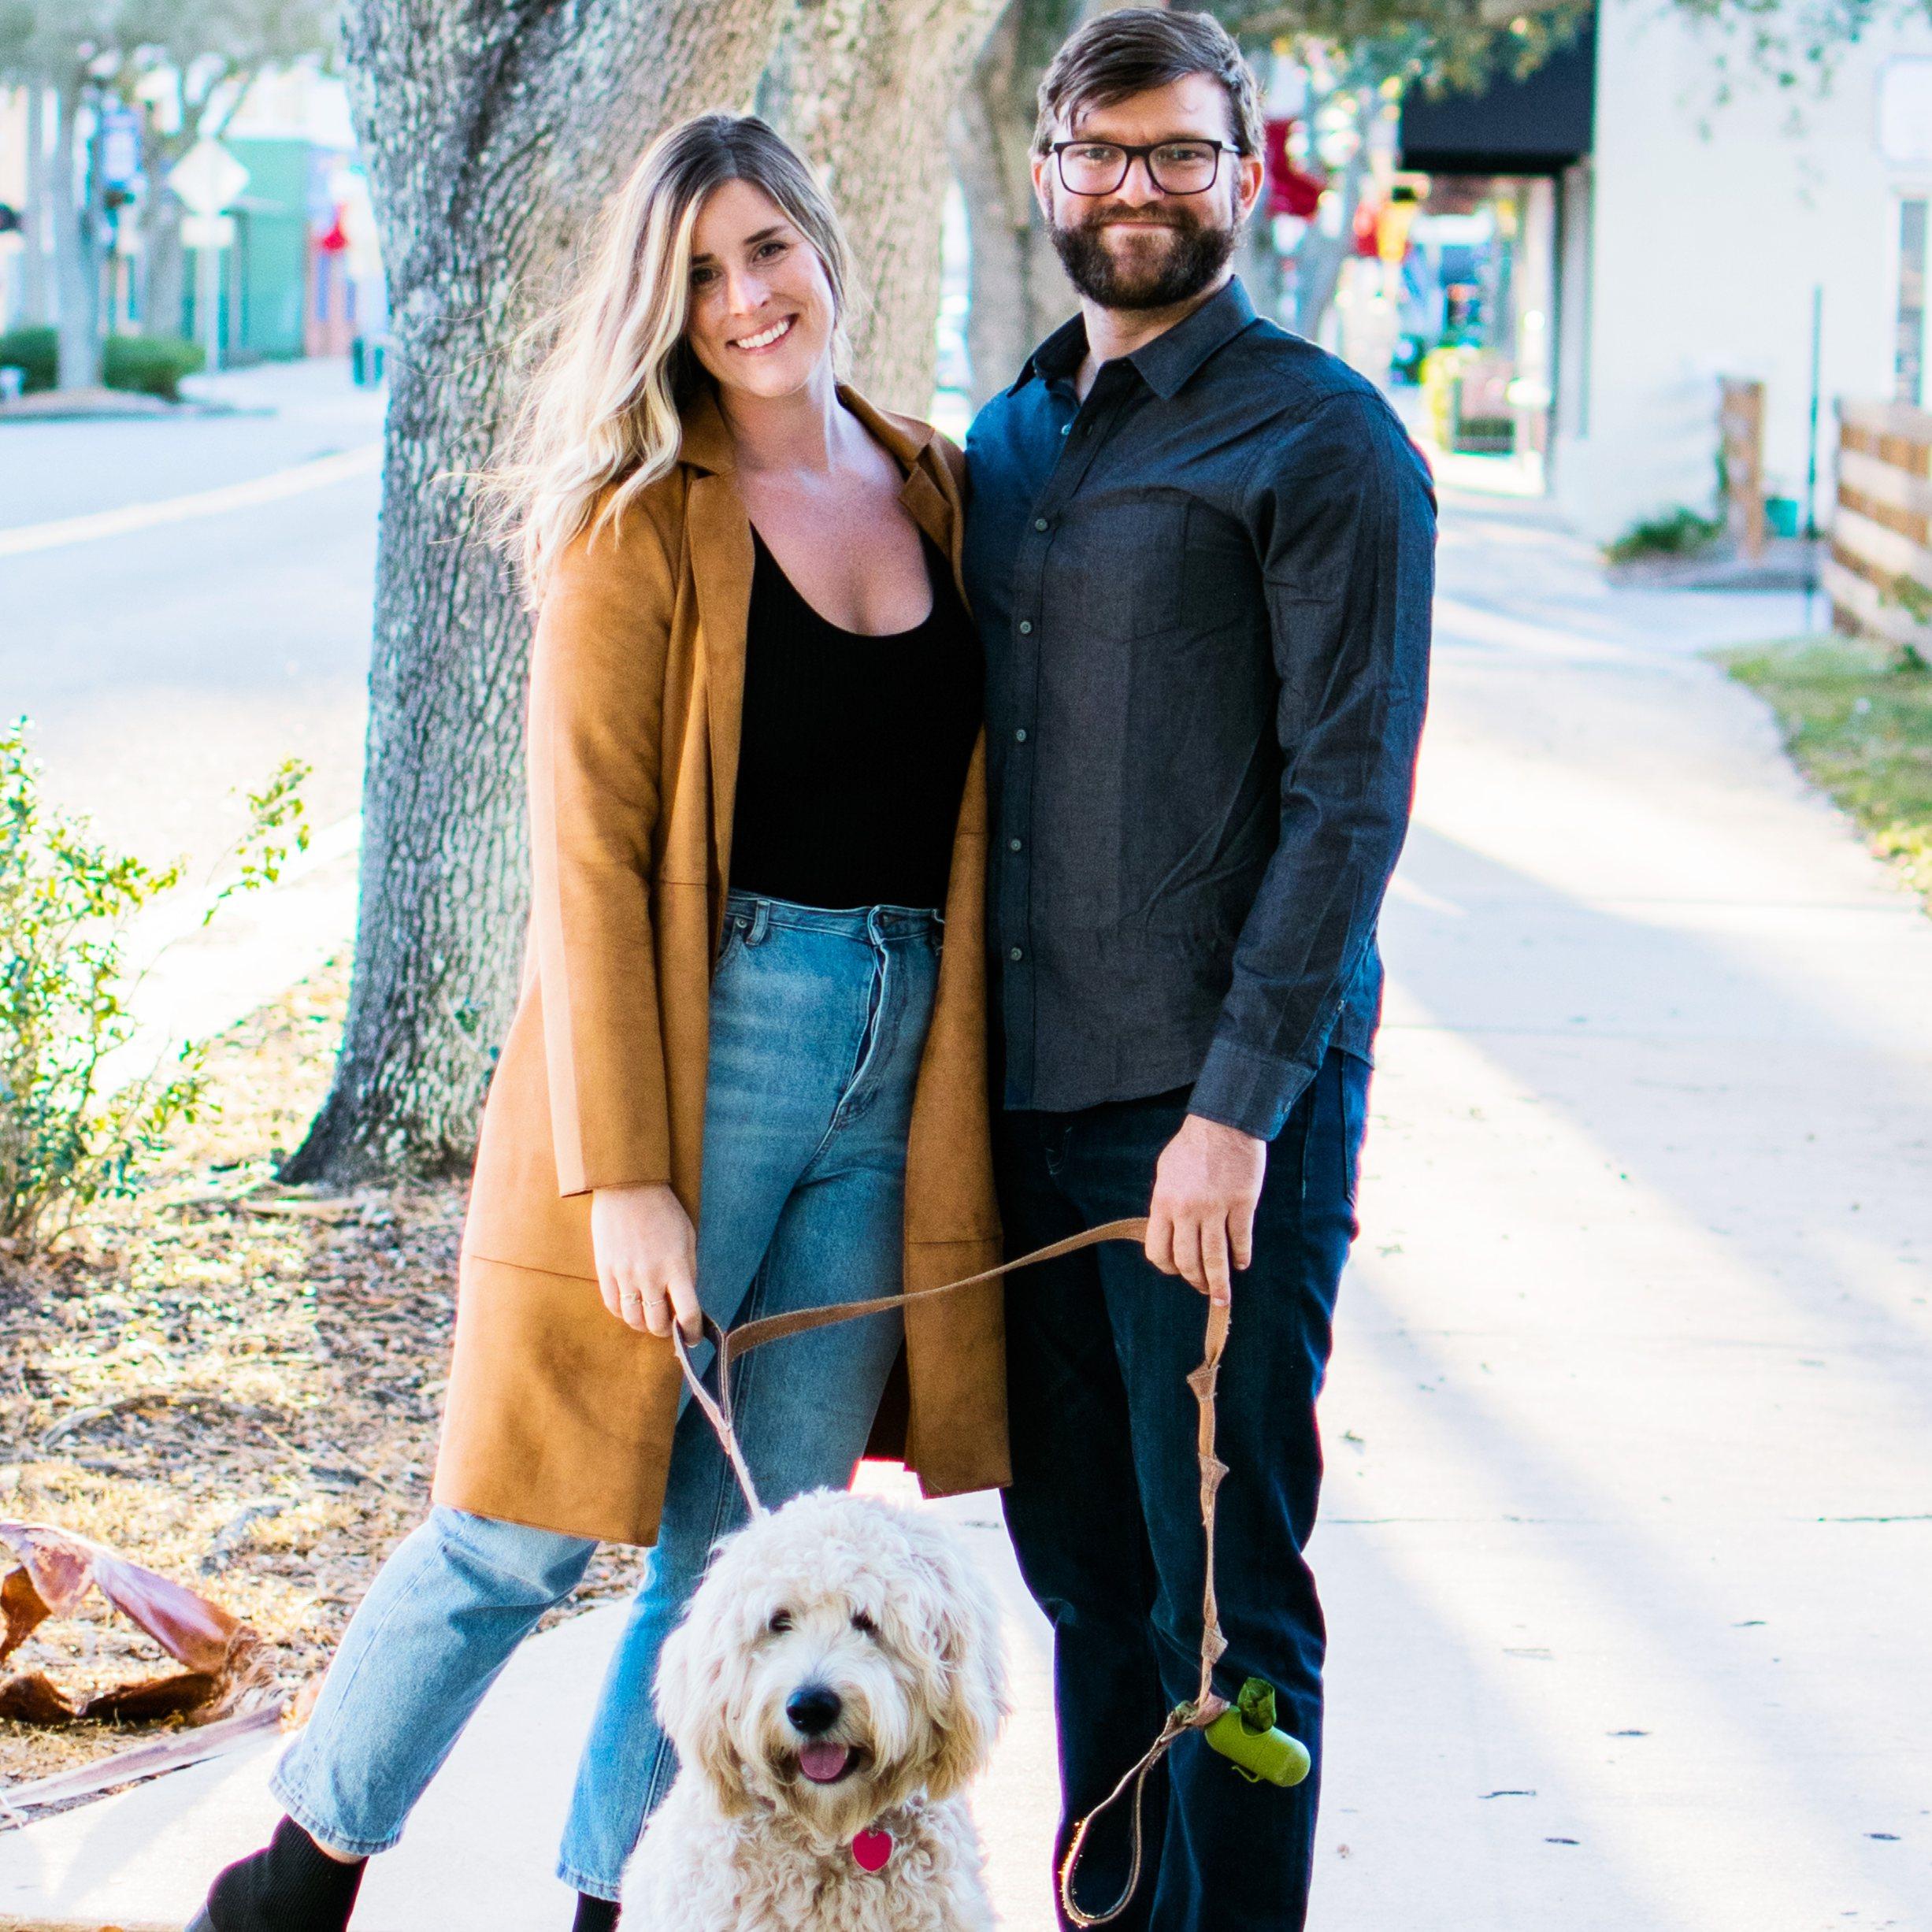 Lee Silvernail and Nikki Waxman